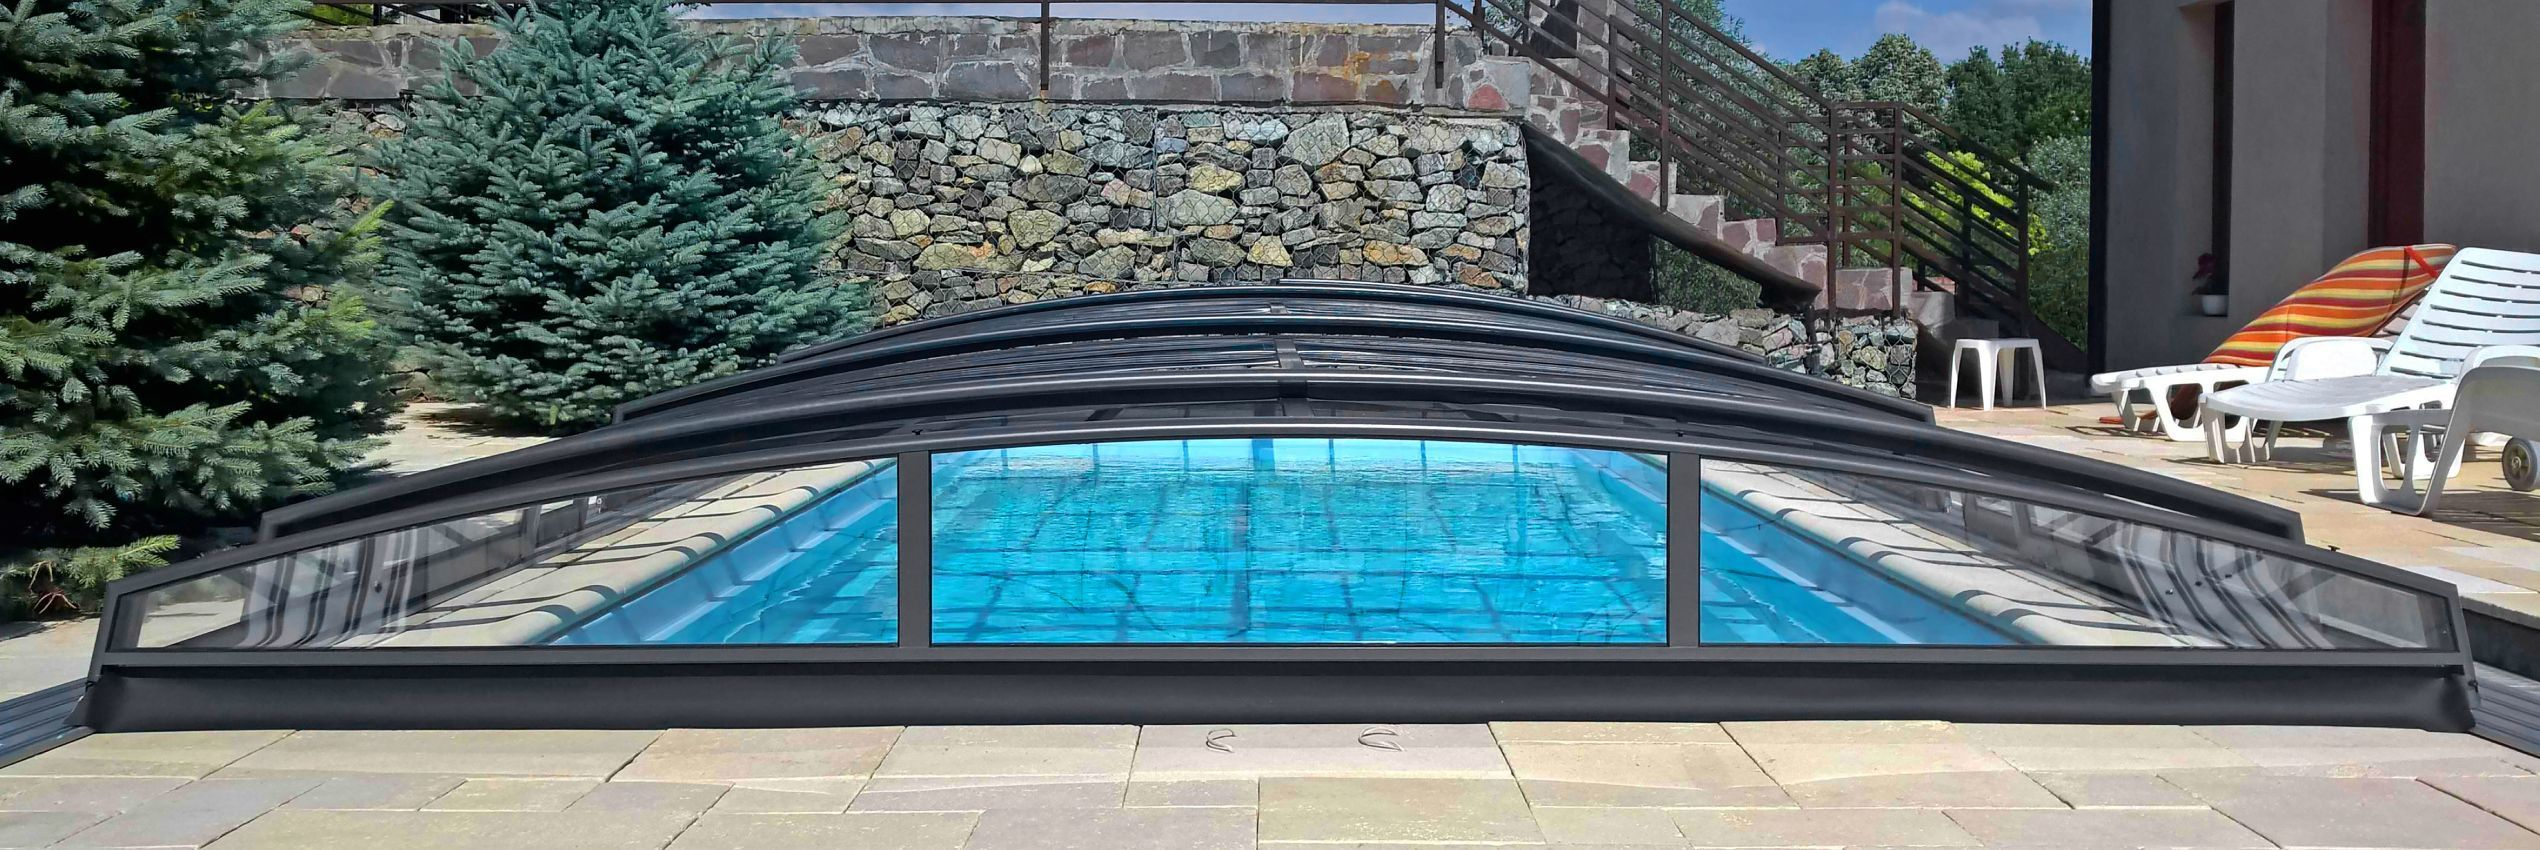 Acoperiri retractabile pentru piscine azure for Acoperiri piscine